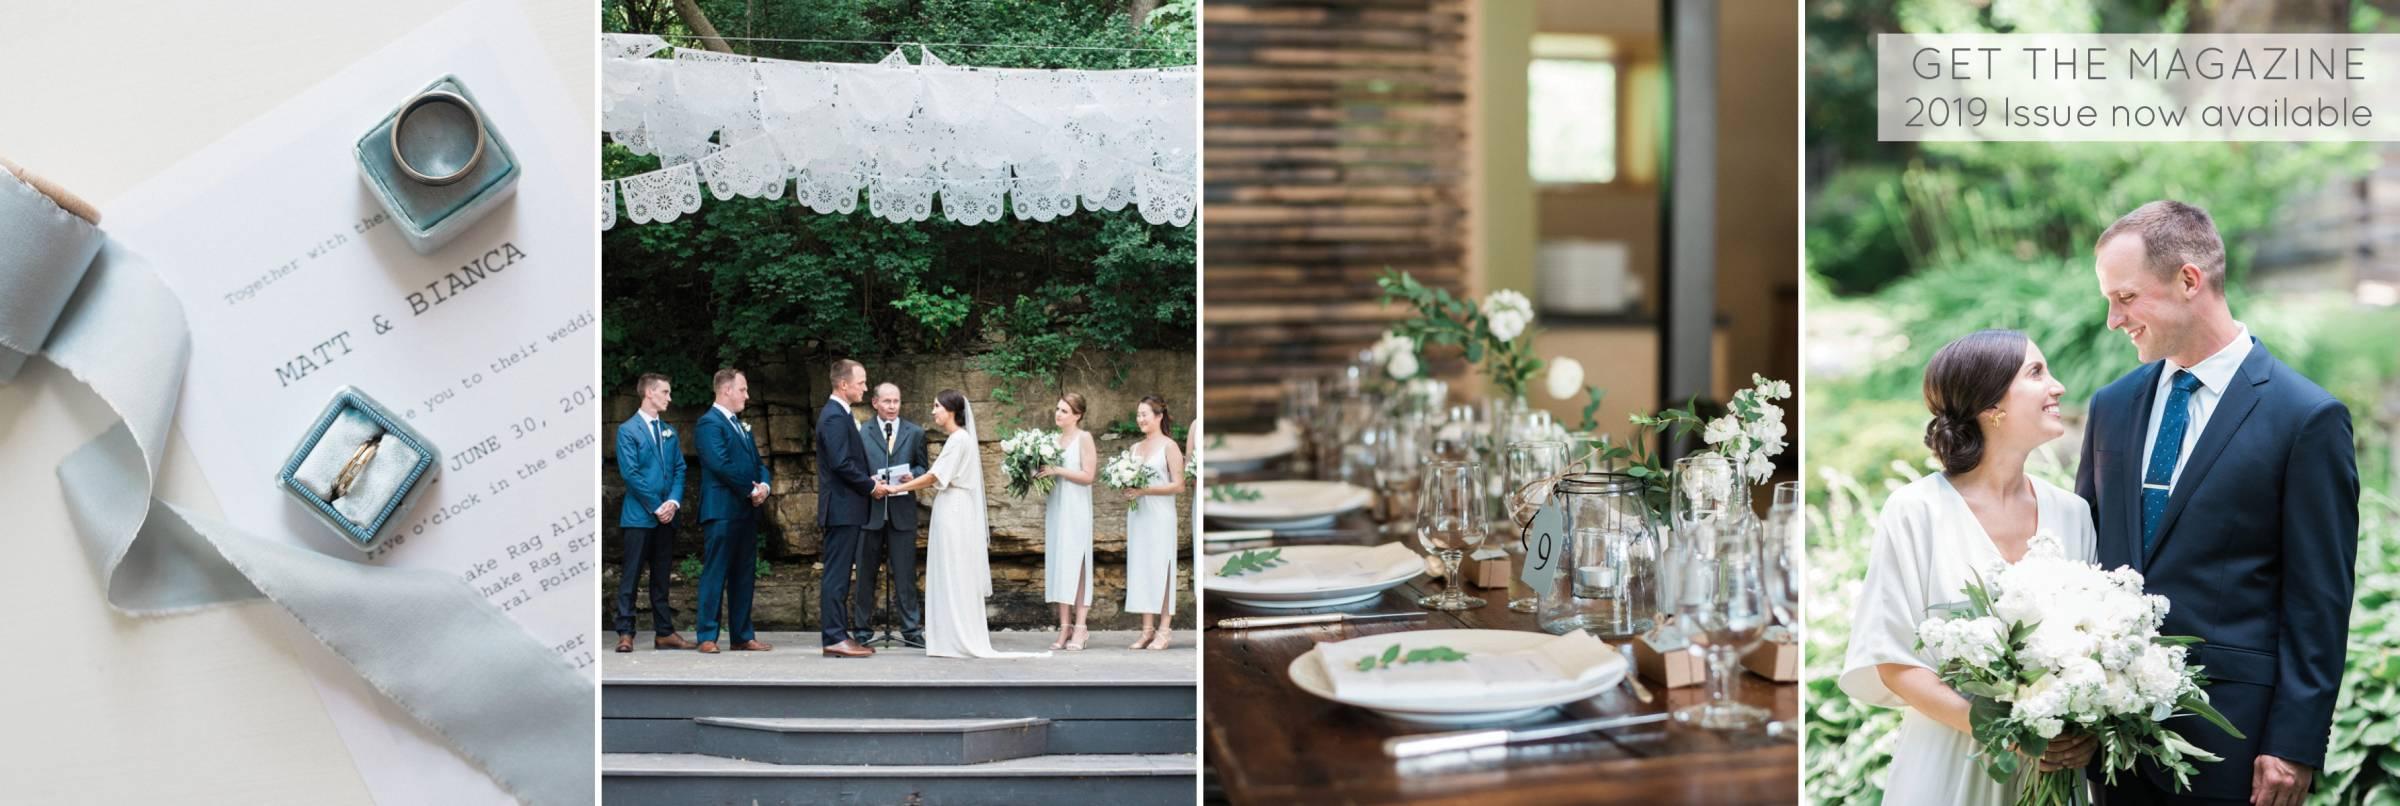 Wedding Planner & Guide   Wedplan com